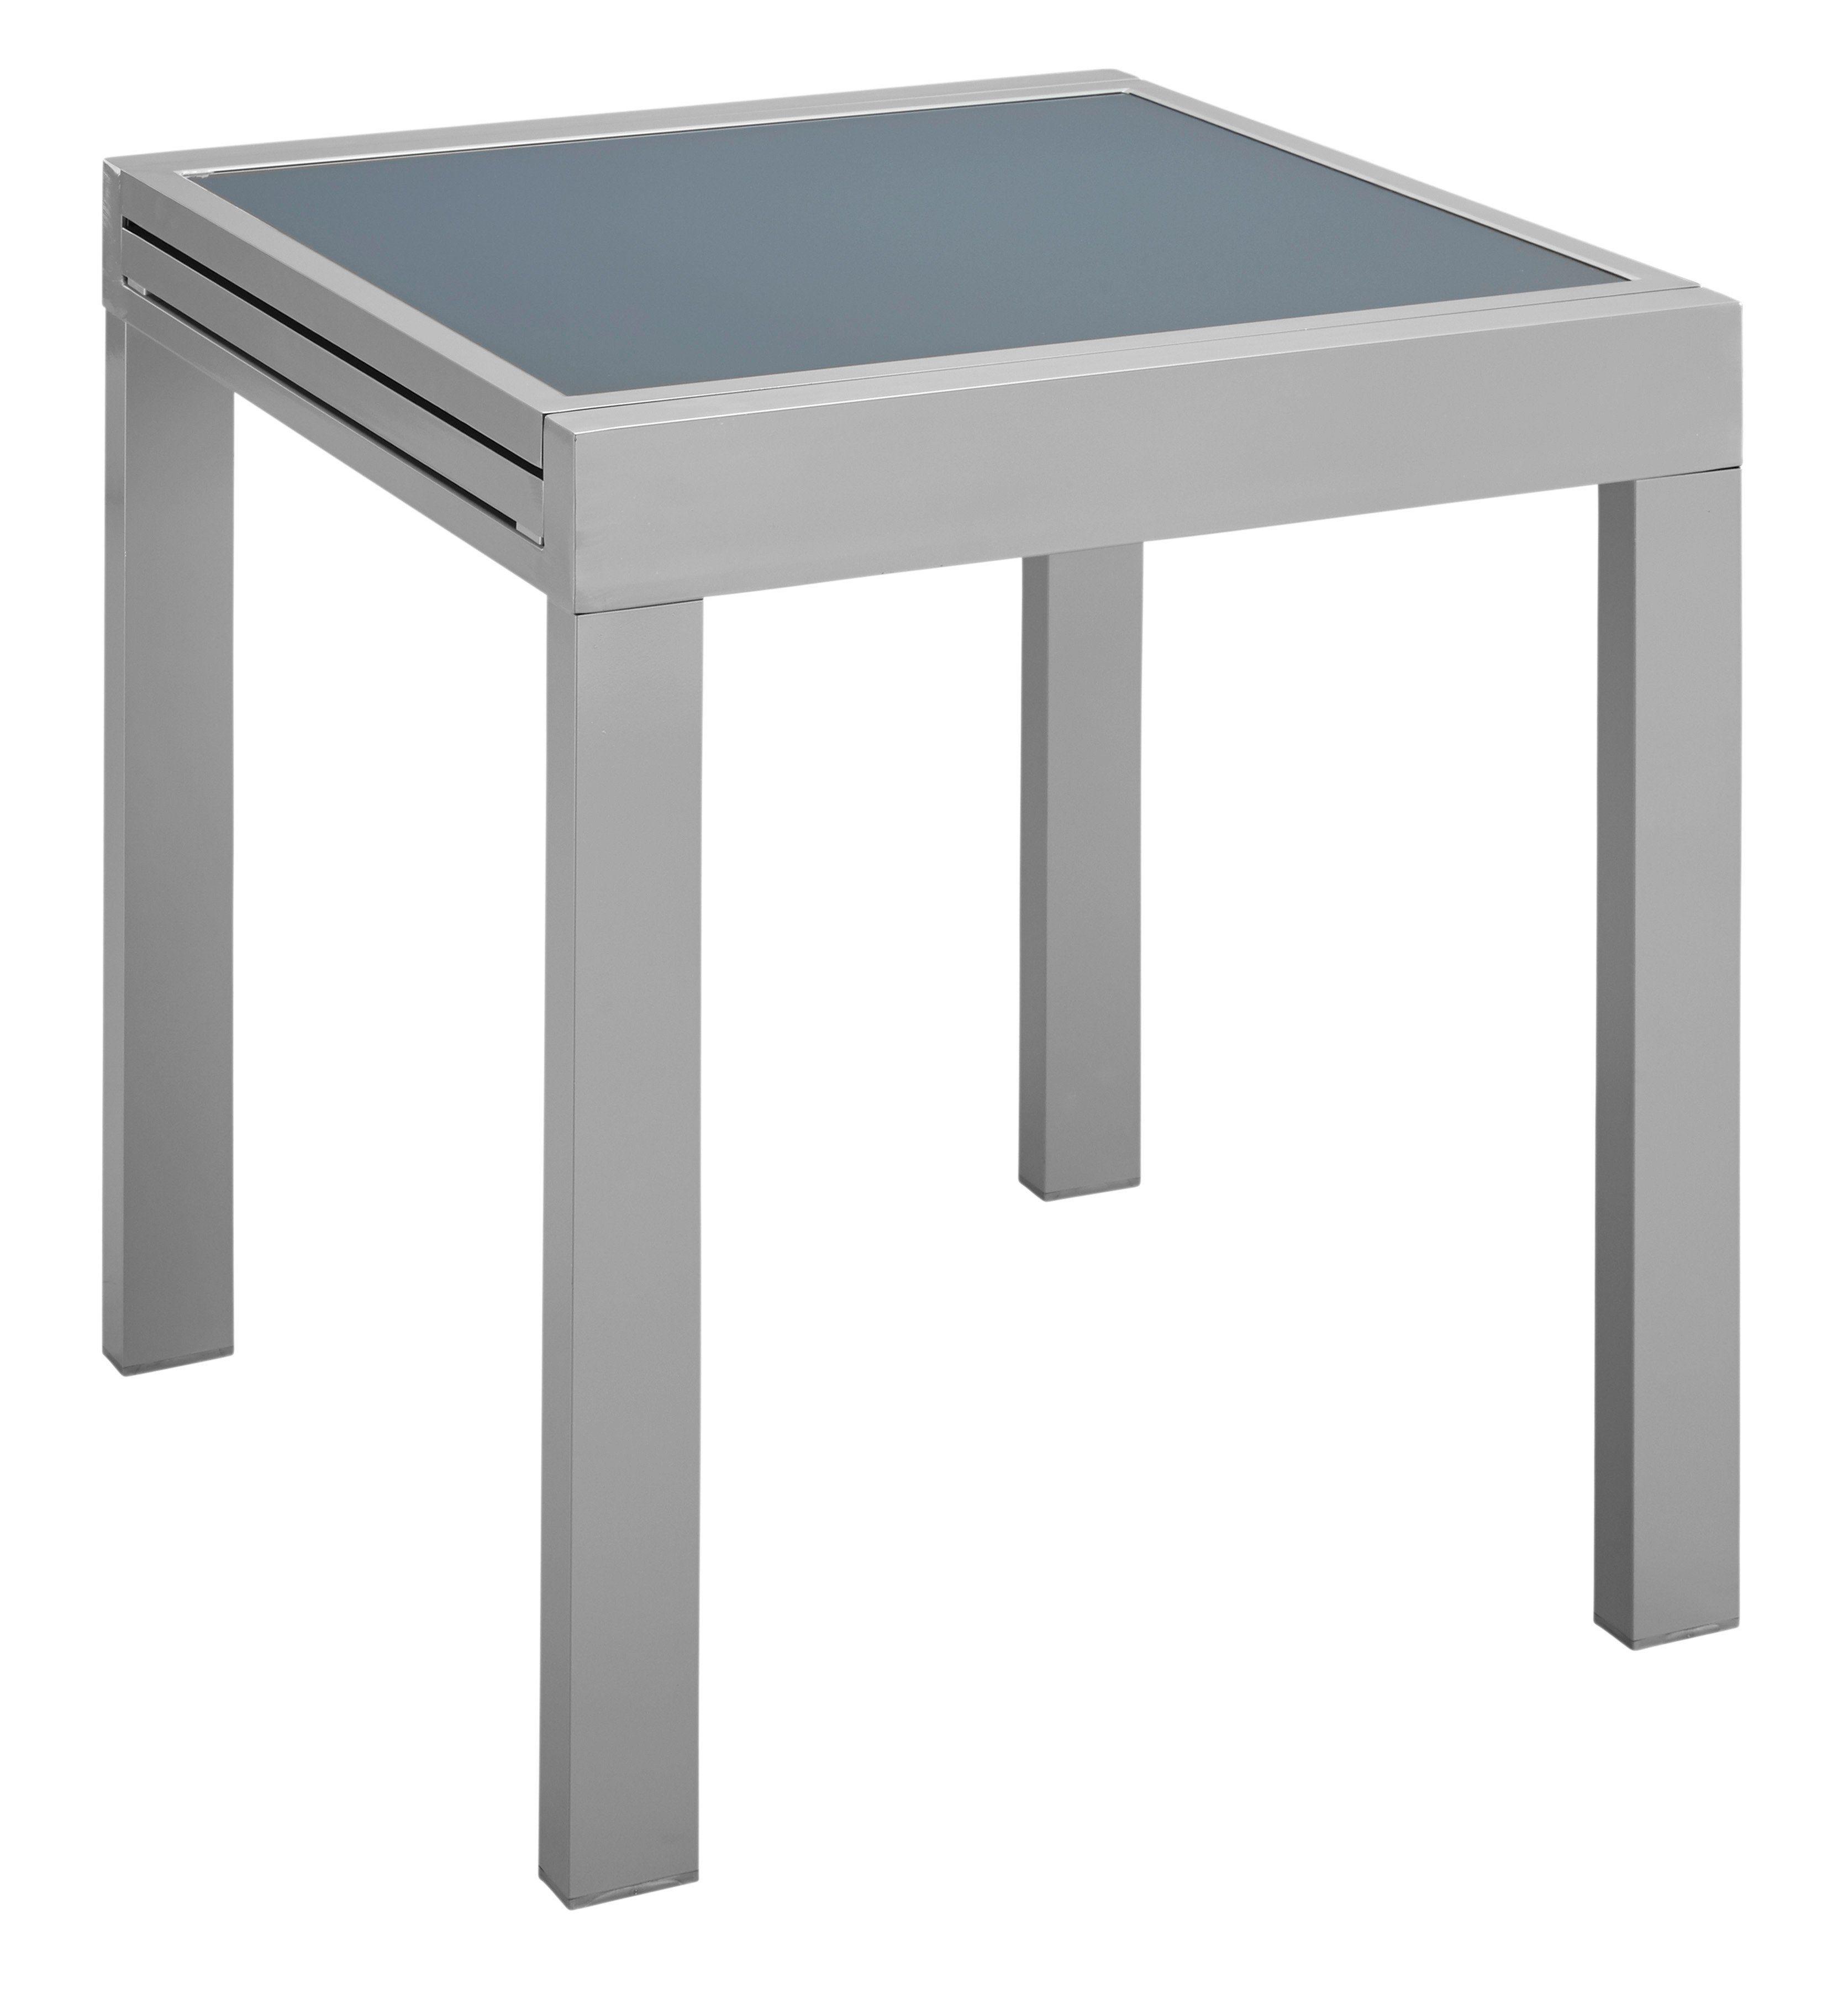 Gartentisch »Lima«, Aluminium, ausziehbar, 130x65 cm